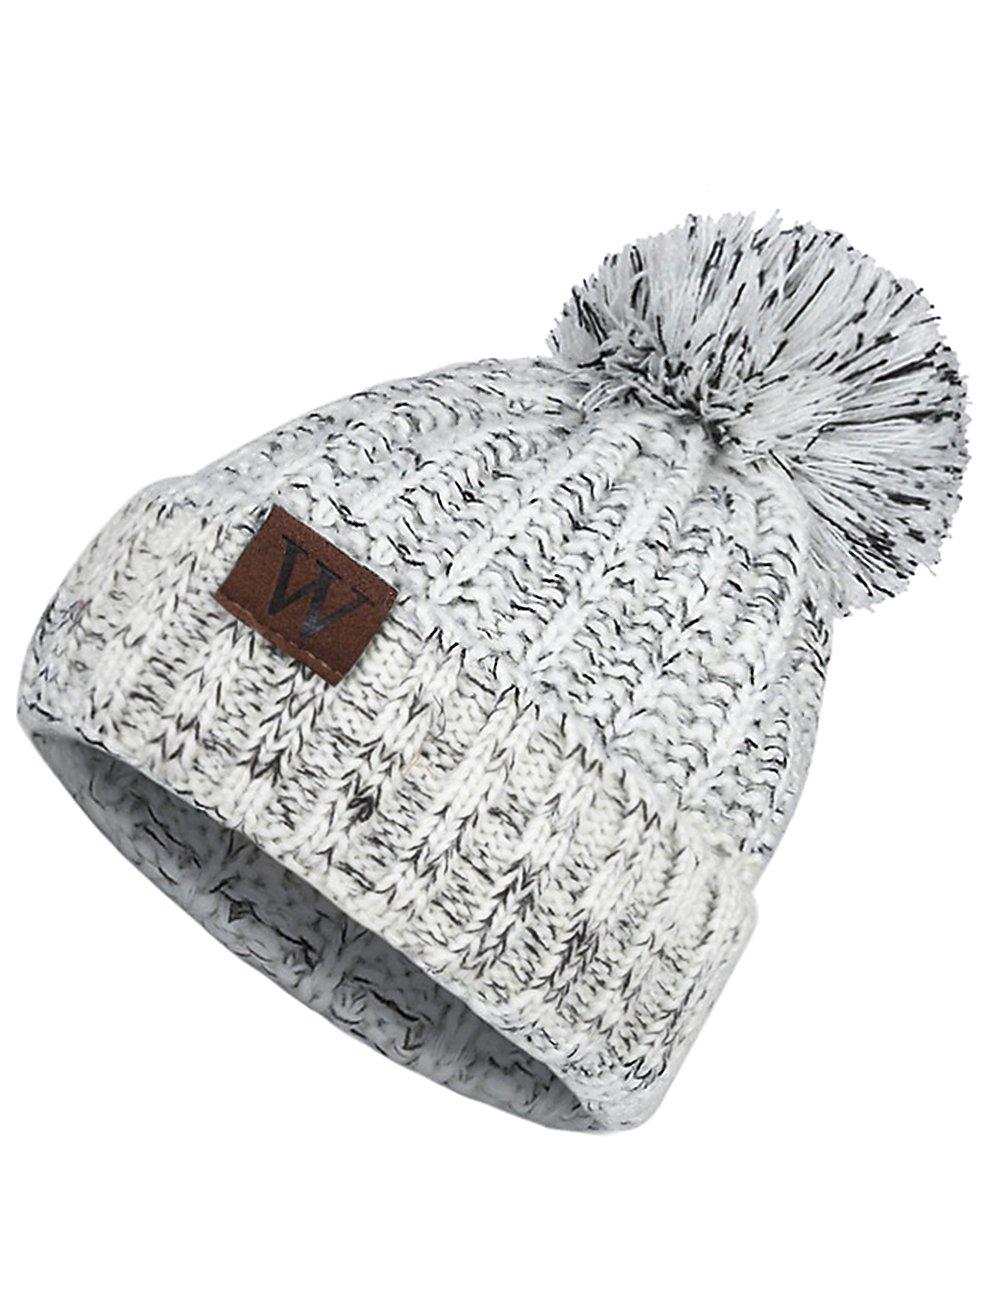 EVRFELAN Winter Fox Pompom Beanie Cable Knit Warm Hat Ribbed Ski Skull Cap (Grey)